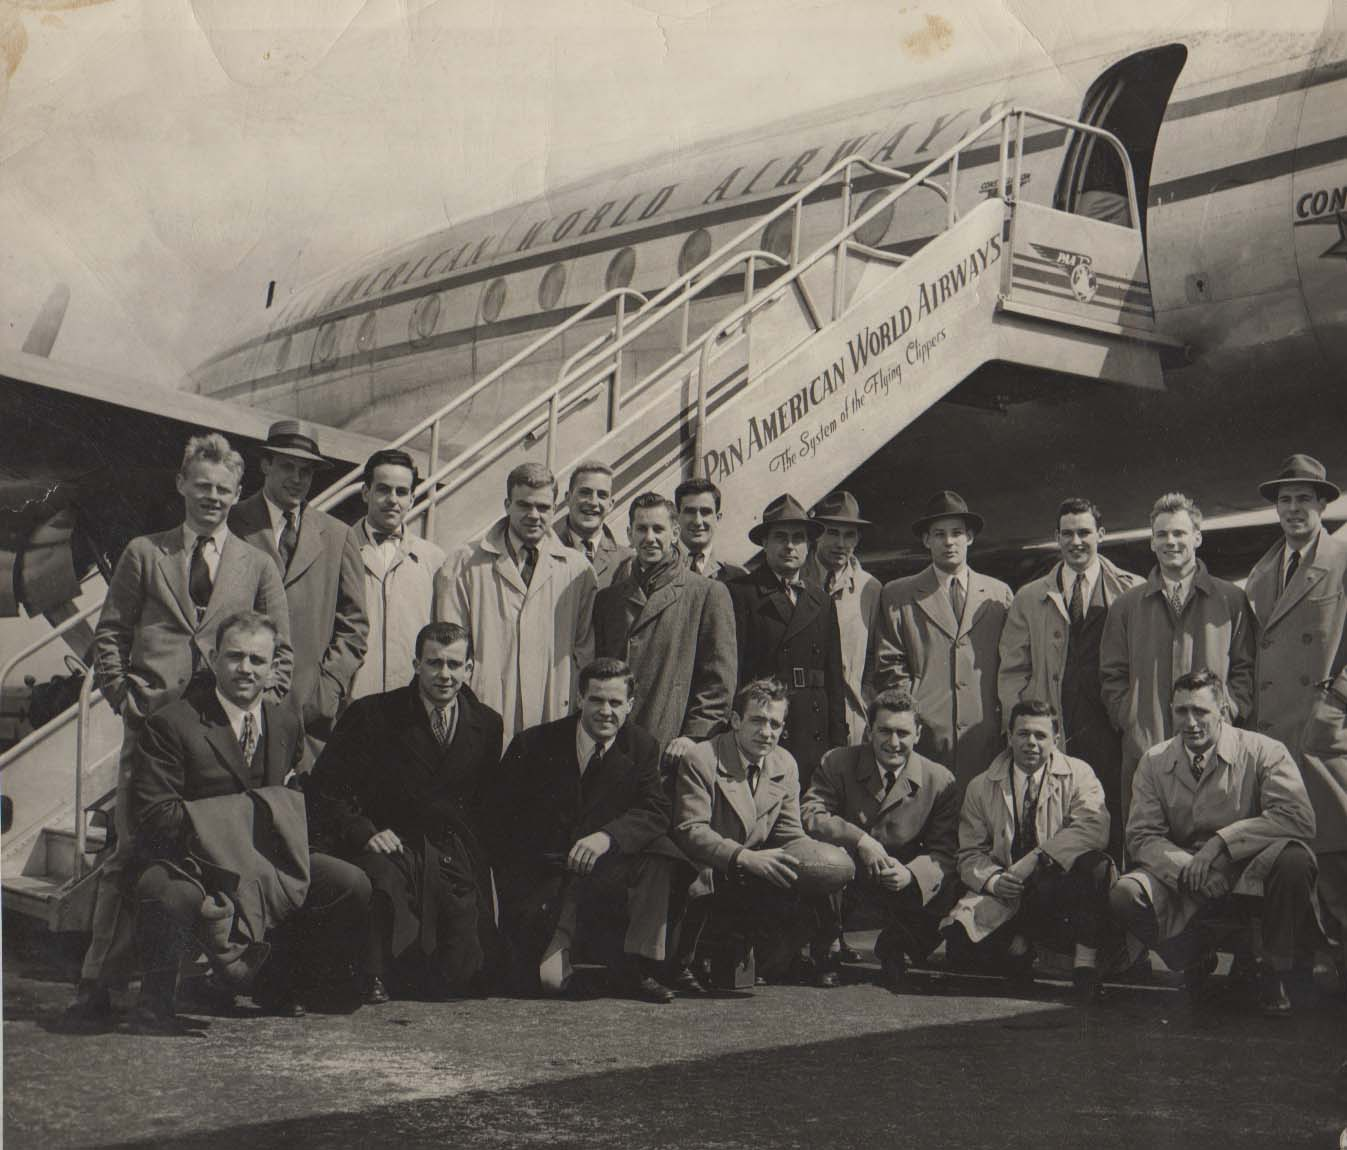 1947 Yale Rugby Team Travels to Bermuda